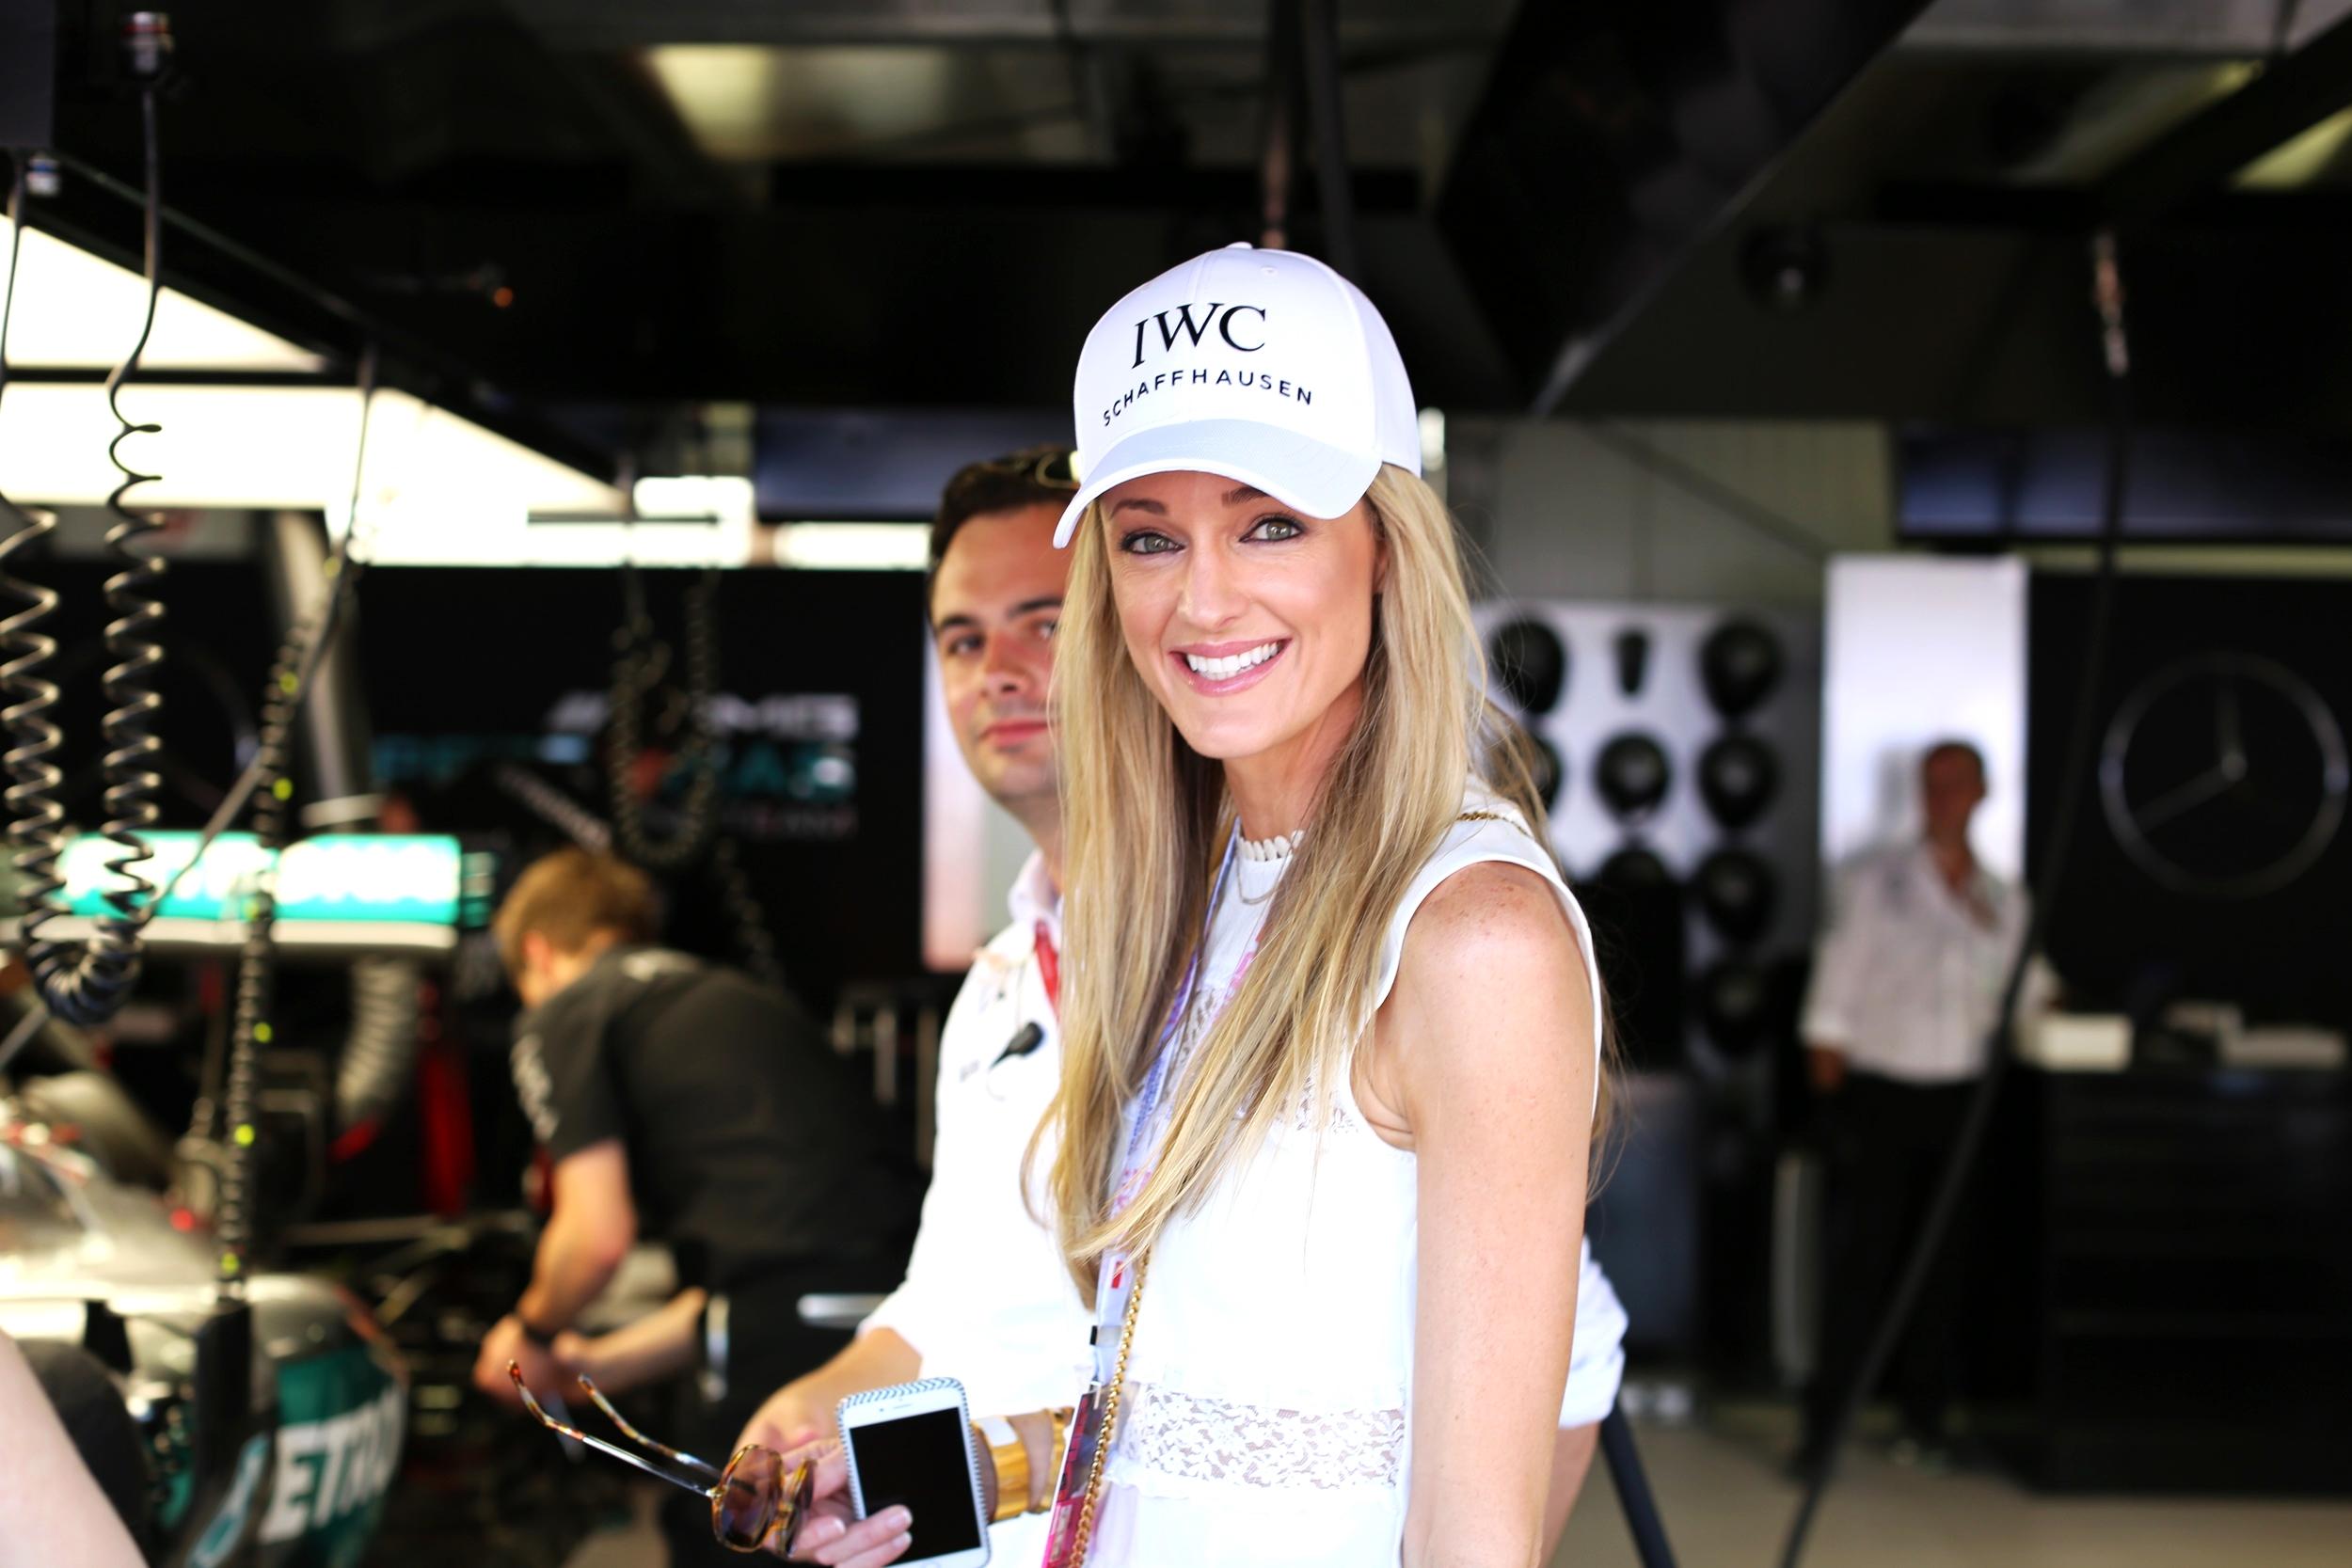 Inside the Mercedes AMG Petronas garage on Pit Lane